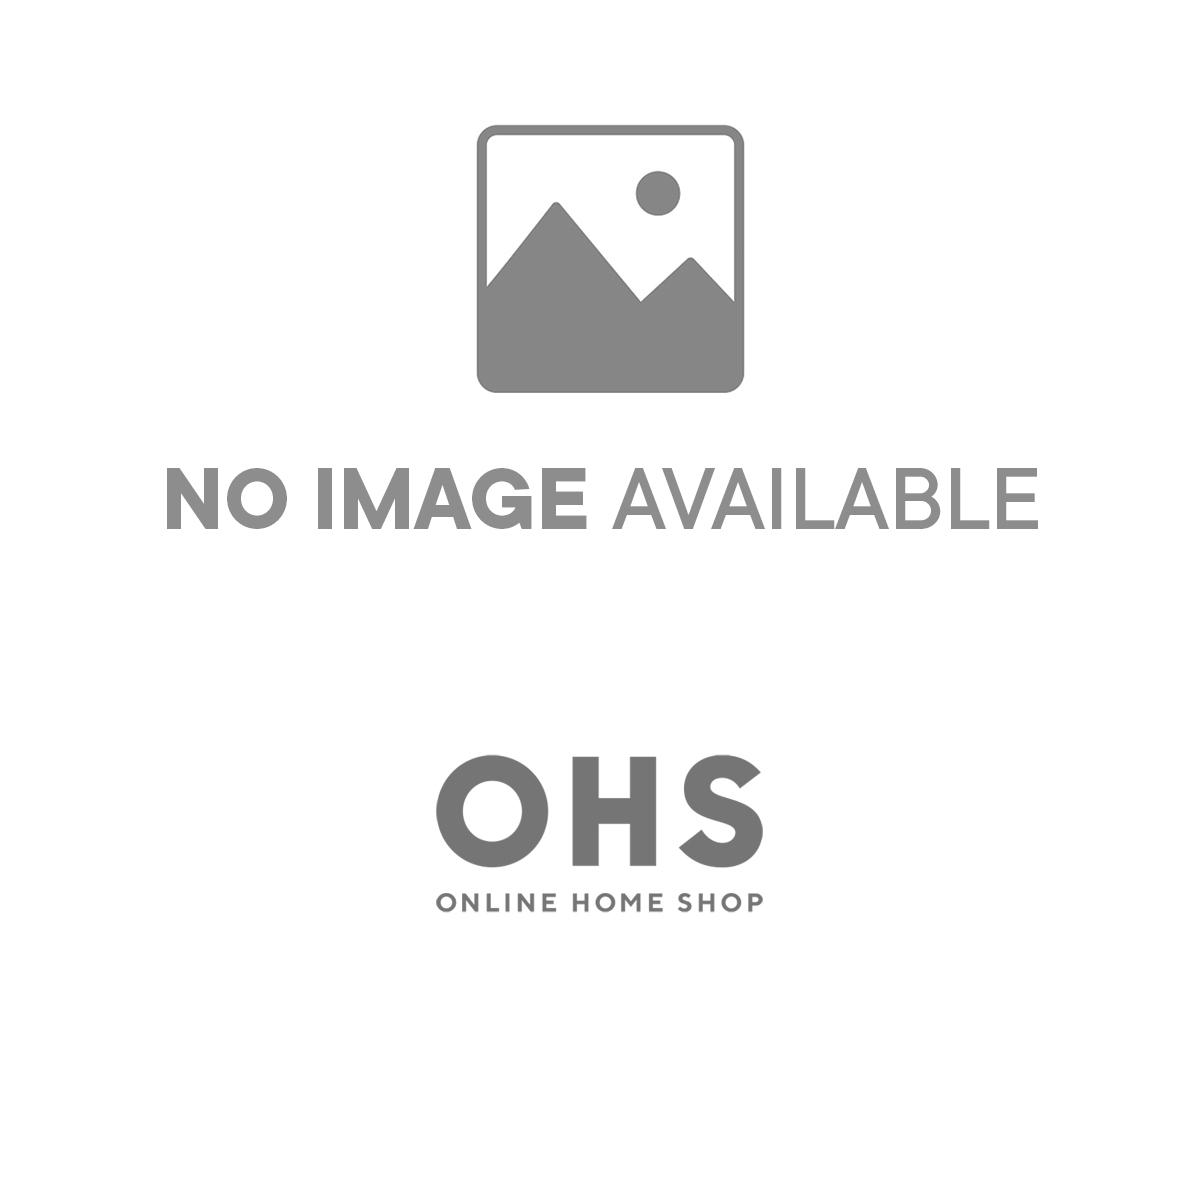 Sienna Crushed Velvet Band Duvet Set - Silver Grey